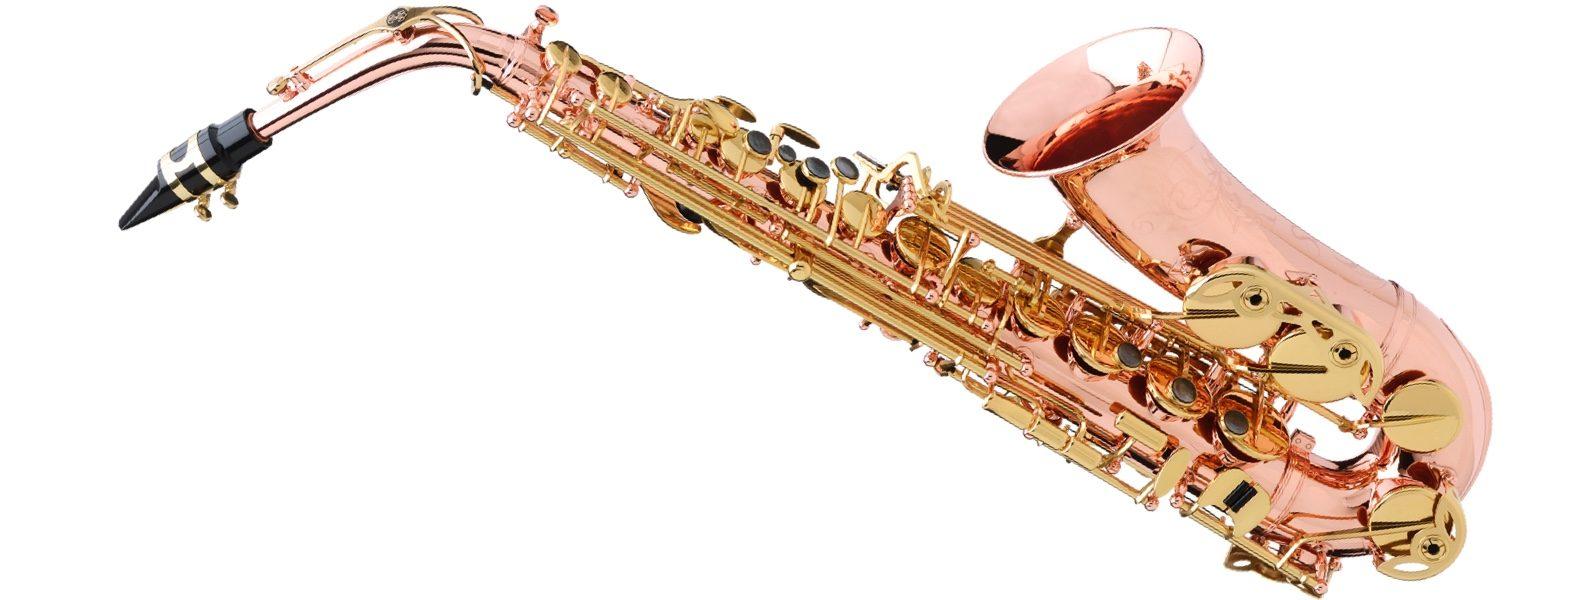 Groovy Saxophones Buffet Crampon Interior Design Ideas Lukepblogthenellocom